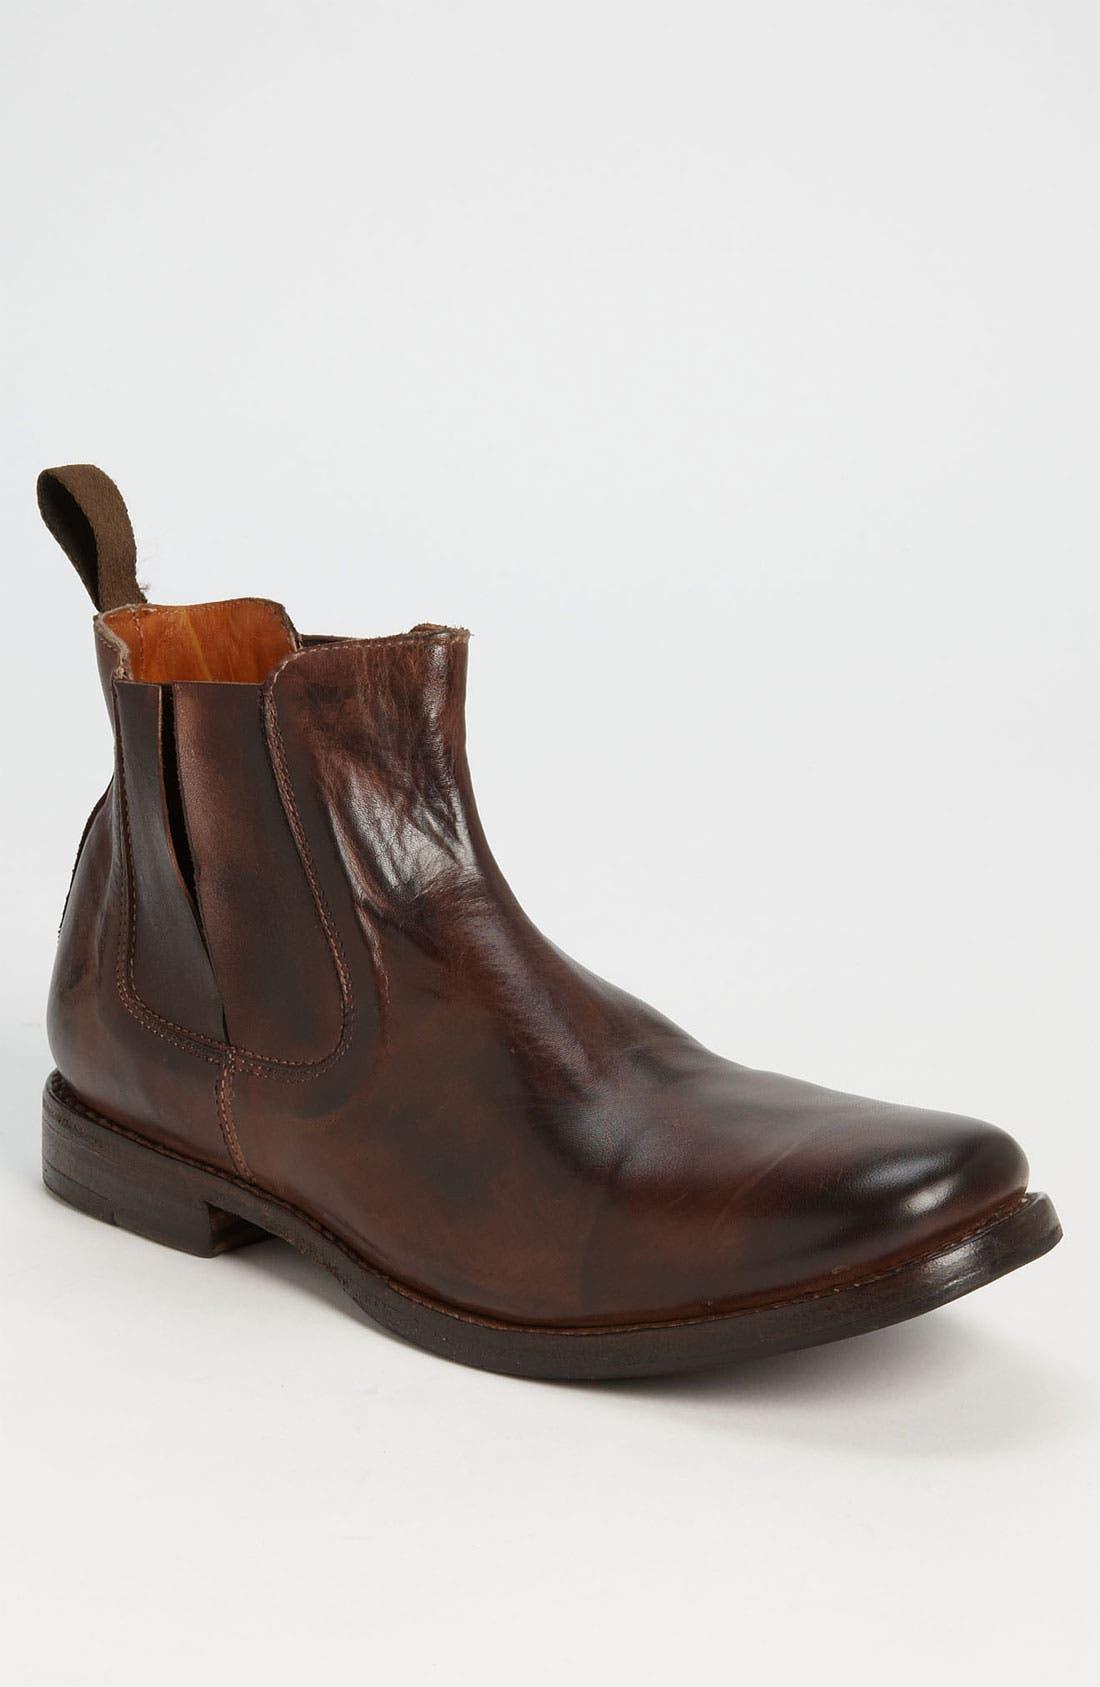 Alternate Image 1 Selected - Bed Stu 'Taurus II' Chelsea Boot